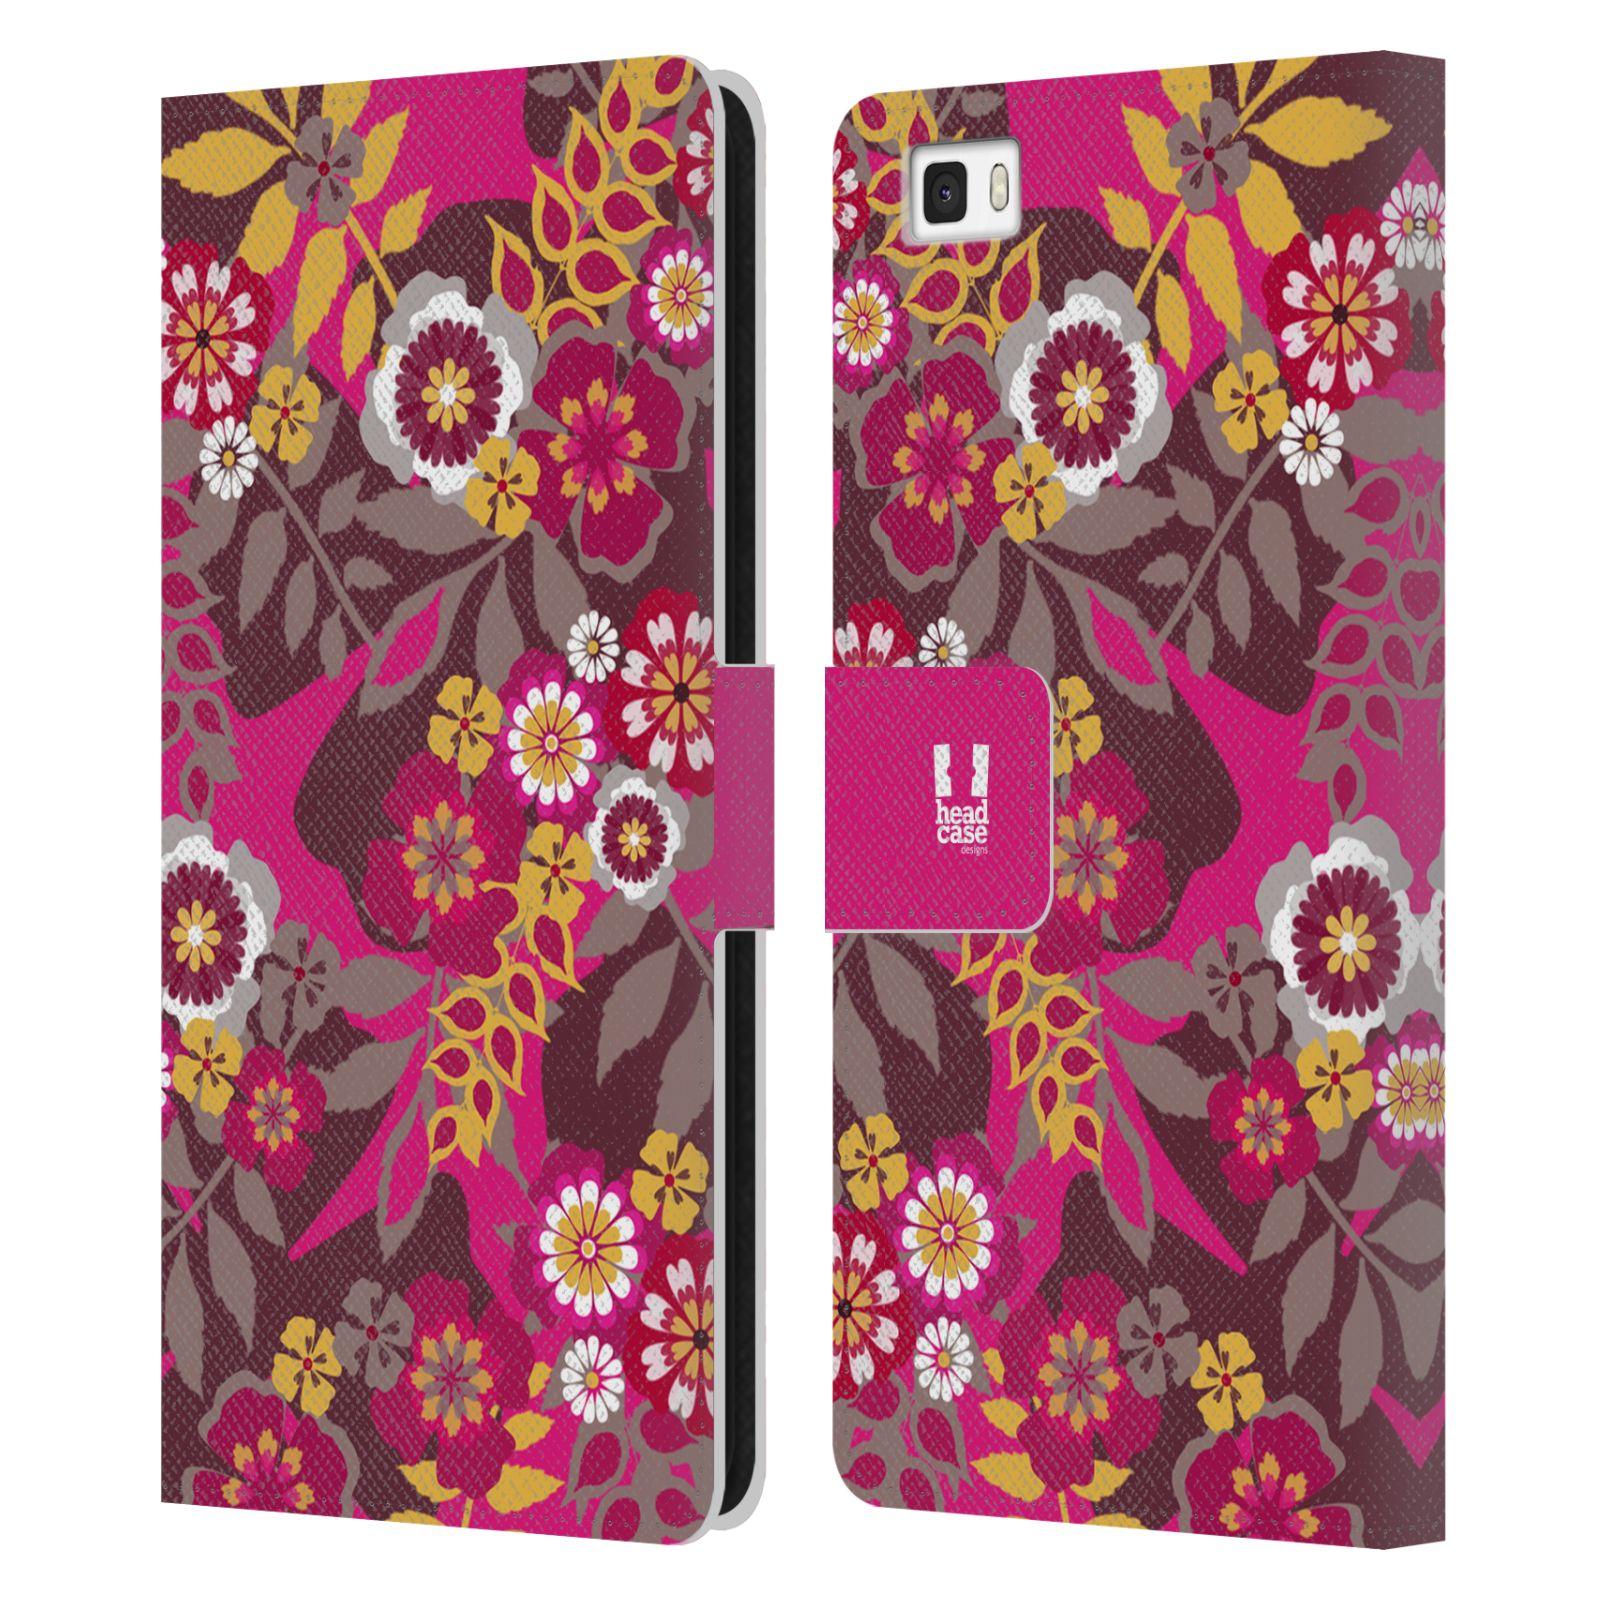 HEAD CASE Flipové pouzdro pro mobil Huawei P8 LITE BOTANIKA růžová a hnědá